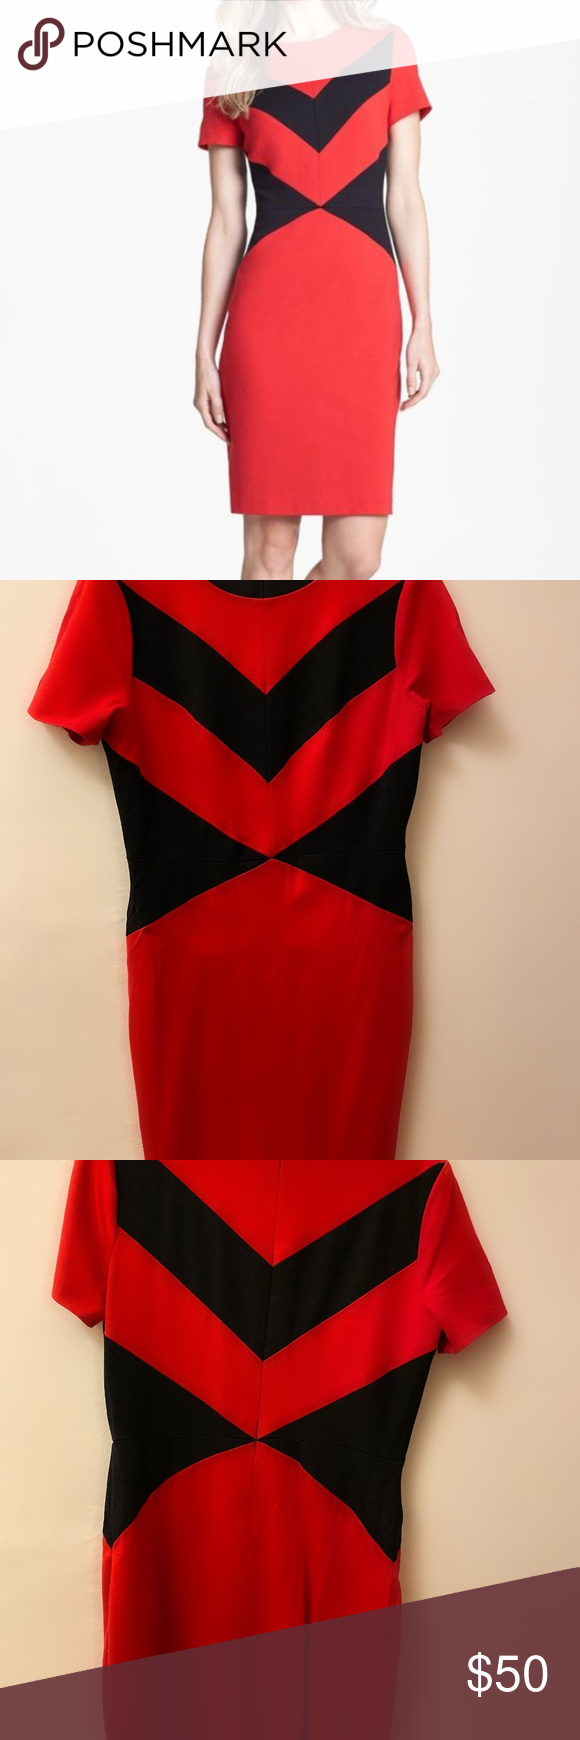 Host Pick Vince Camuto Red Black Zig Zag Dress Zig Zag Dress Clothes Design Black Striped Dress [ 1740 x 580 Pixel ]